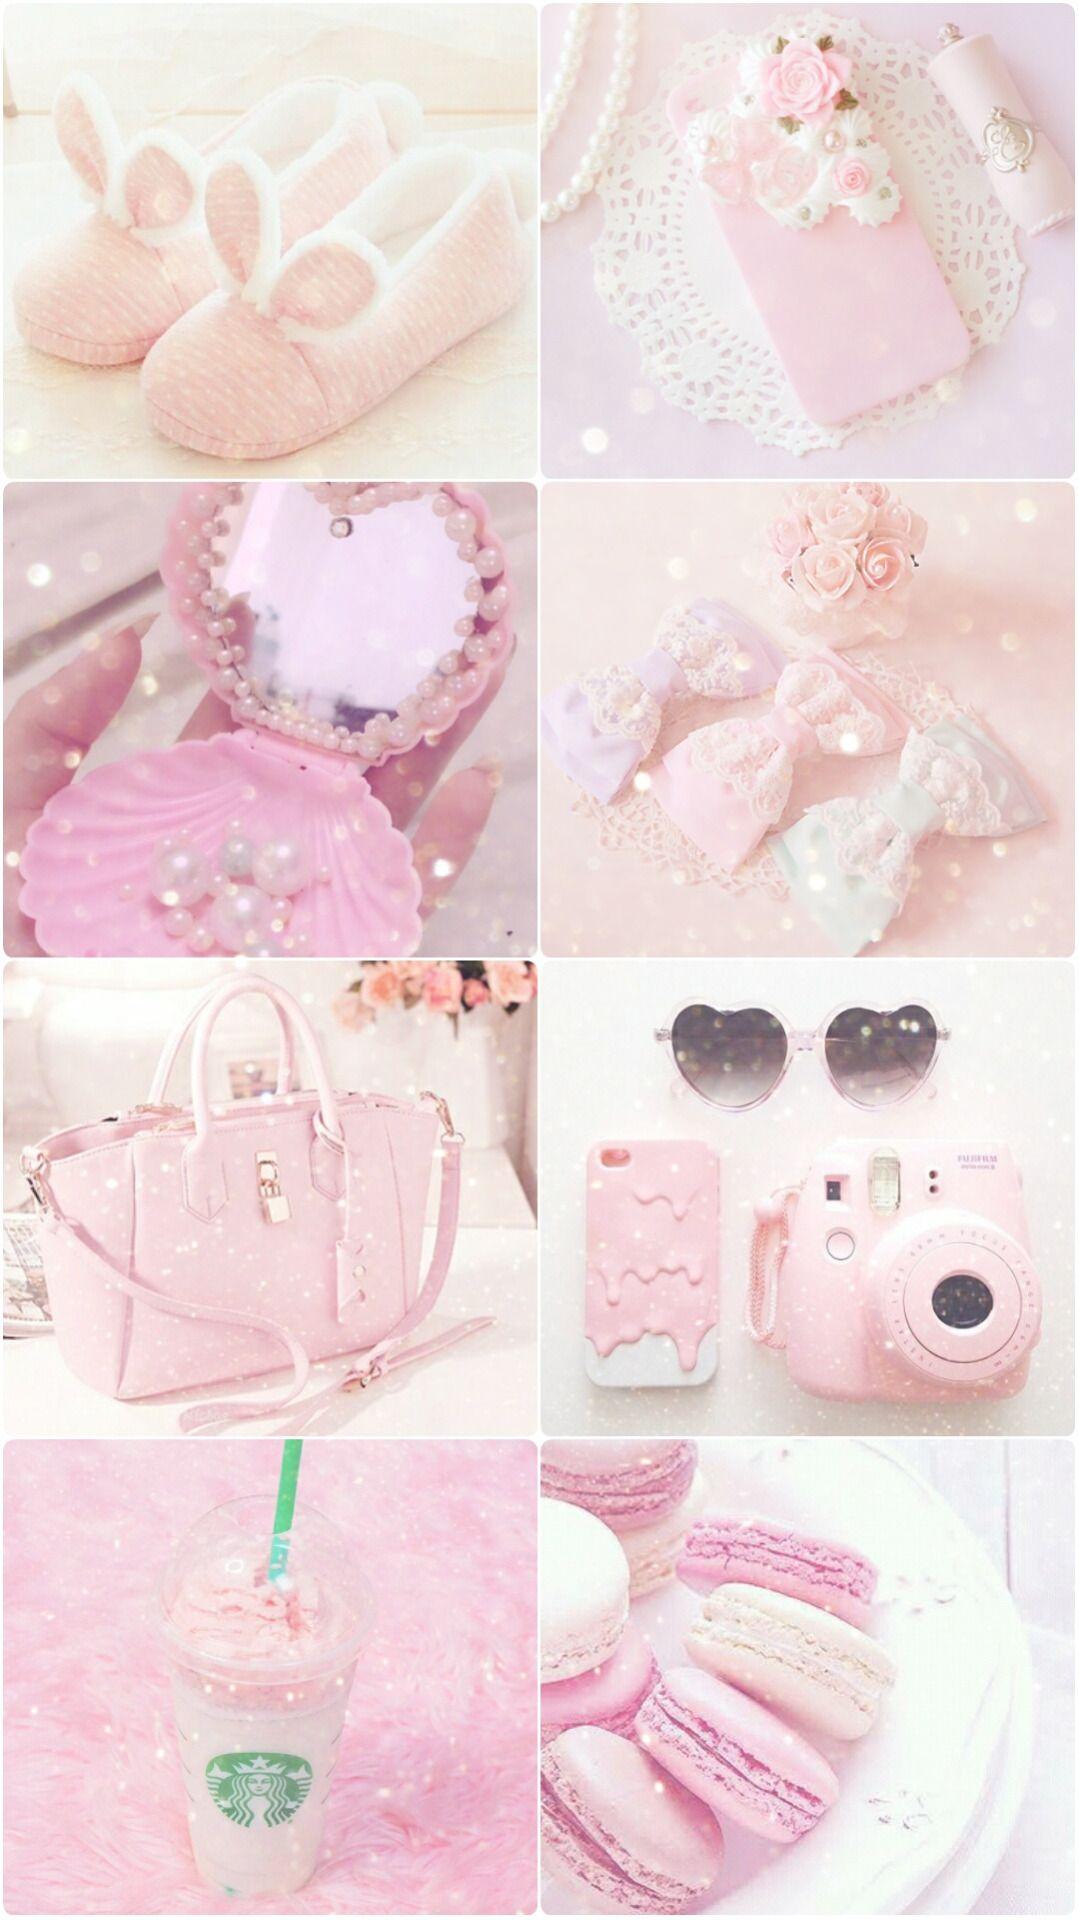 Pink Life Always Pink life, Pink wallpaper, Pink aesthetic